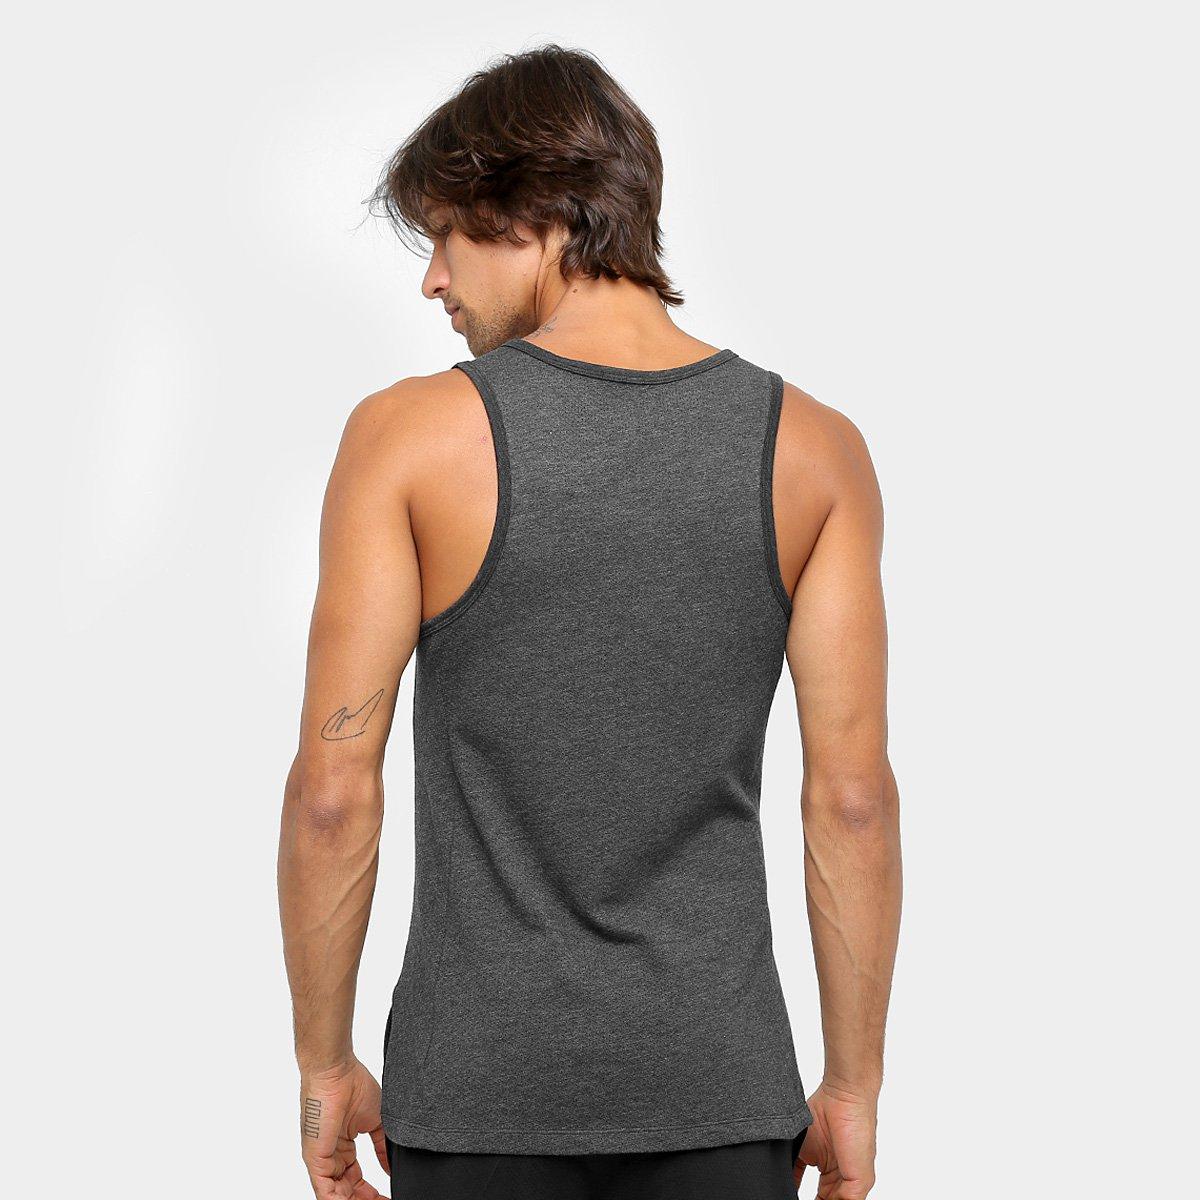 f0afa9df16 Camiseta Regata Nike Top SL Elite Masculina - Compre Agora